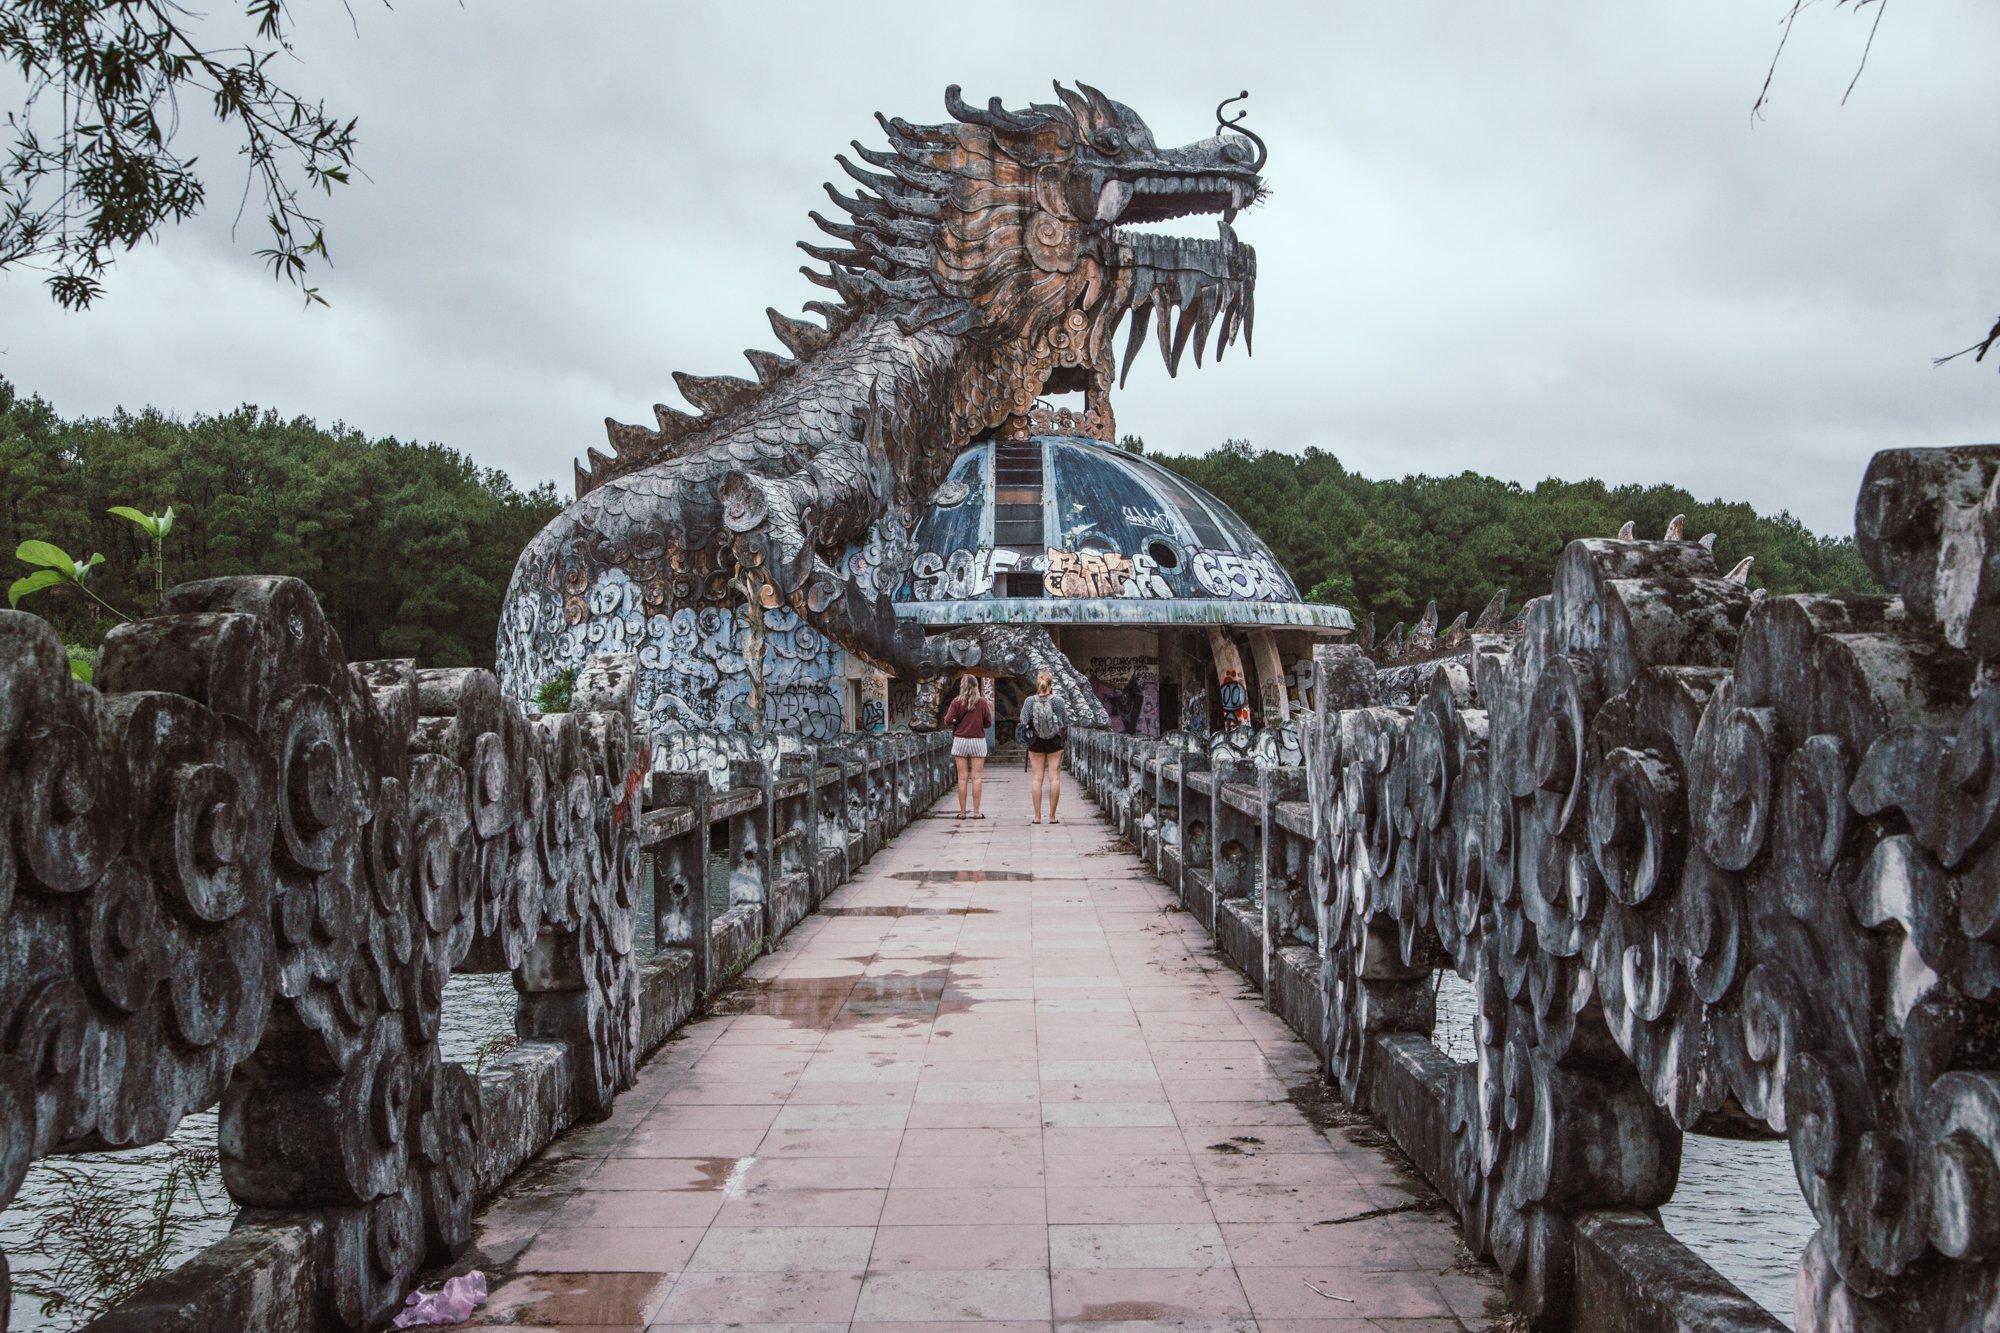 The Dragon at the Abandoned waterpark hue vietnam